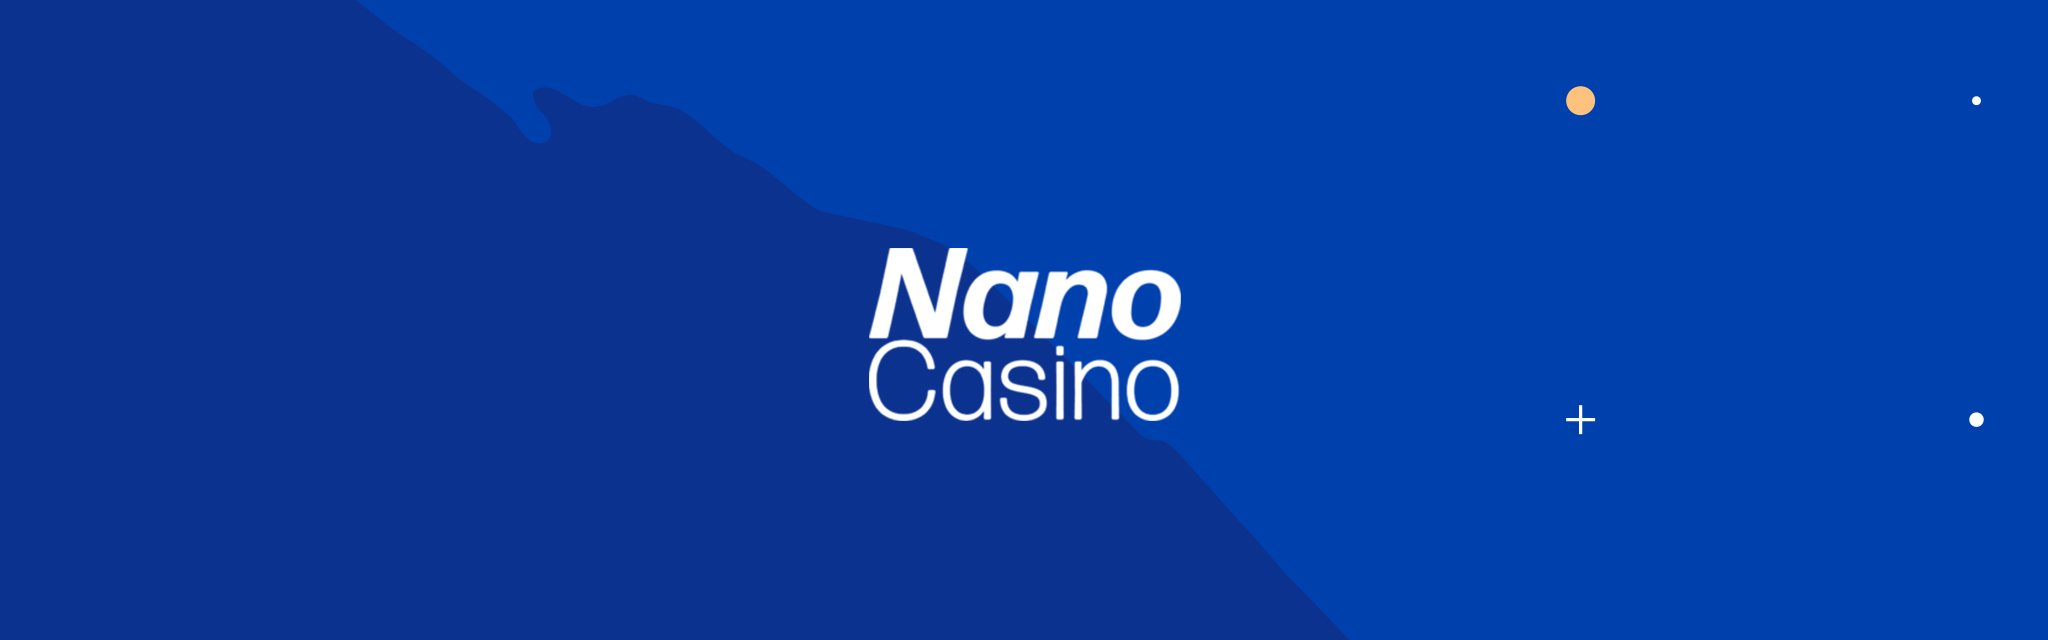 GiG Nano Casino